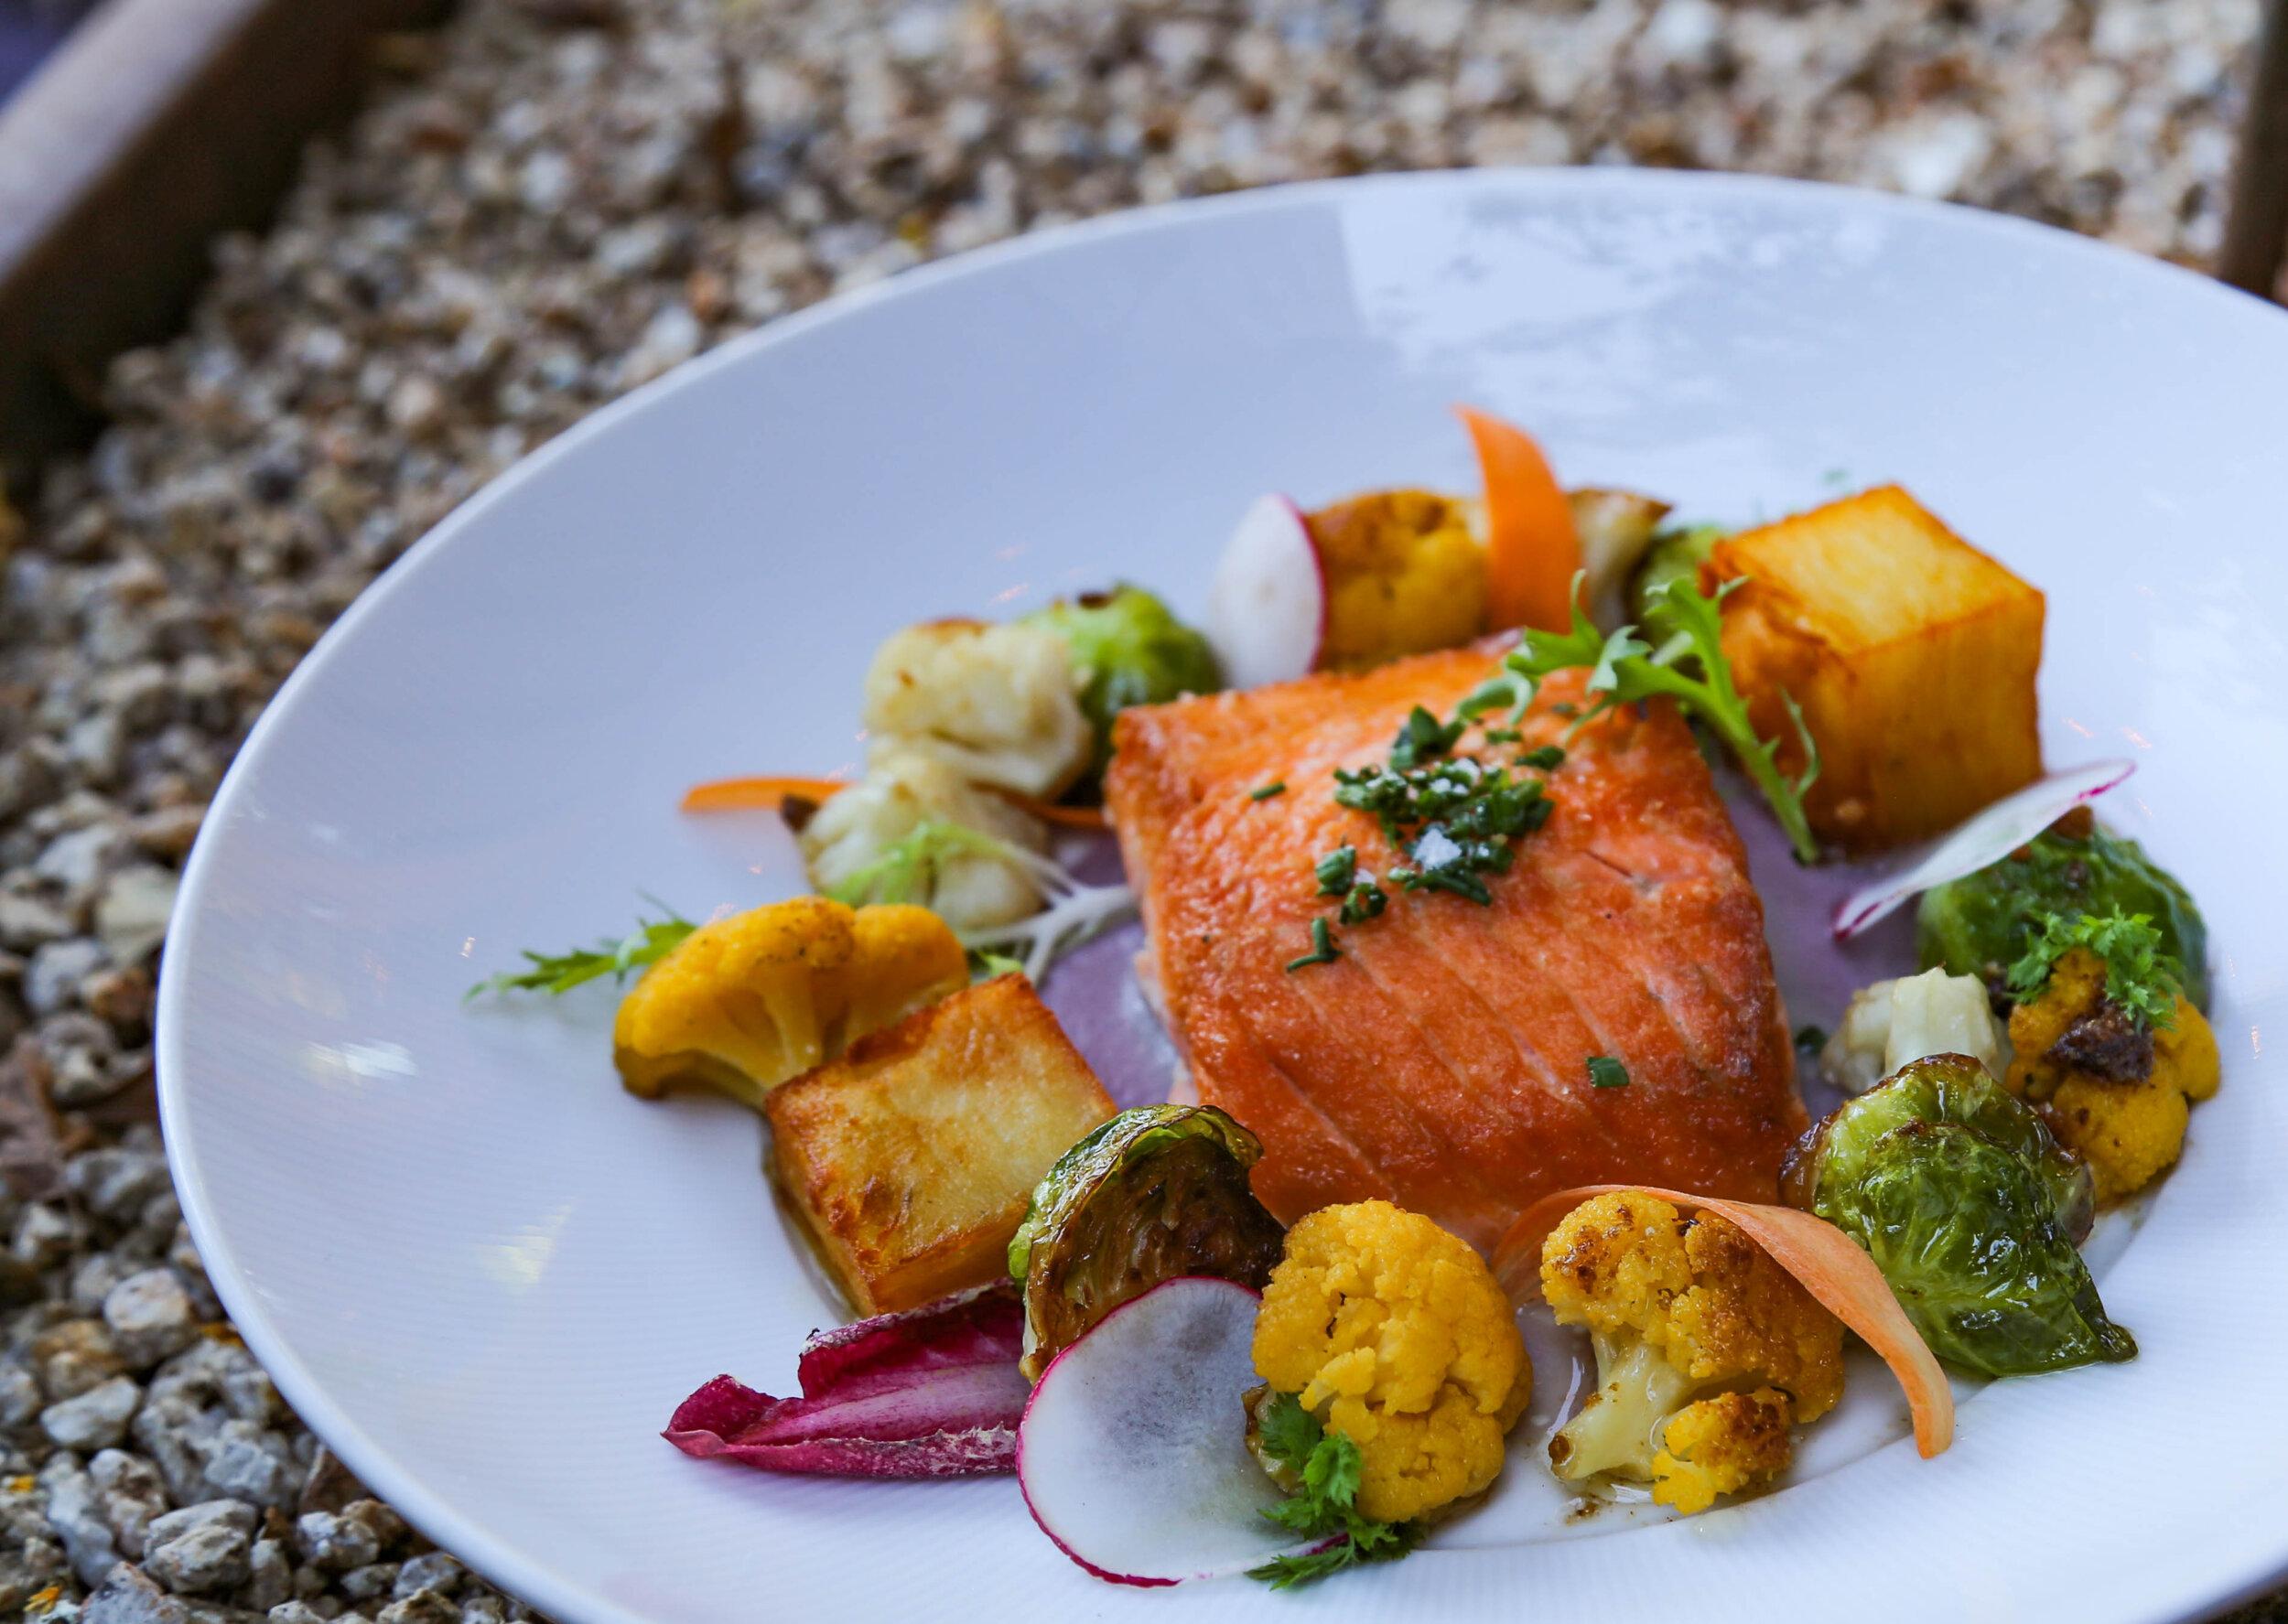 Pan seared salmon, roasted thinly layered sweet potato, orange cauliflower, red wine soubise